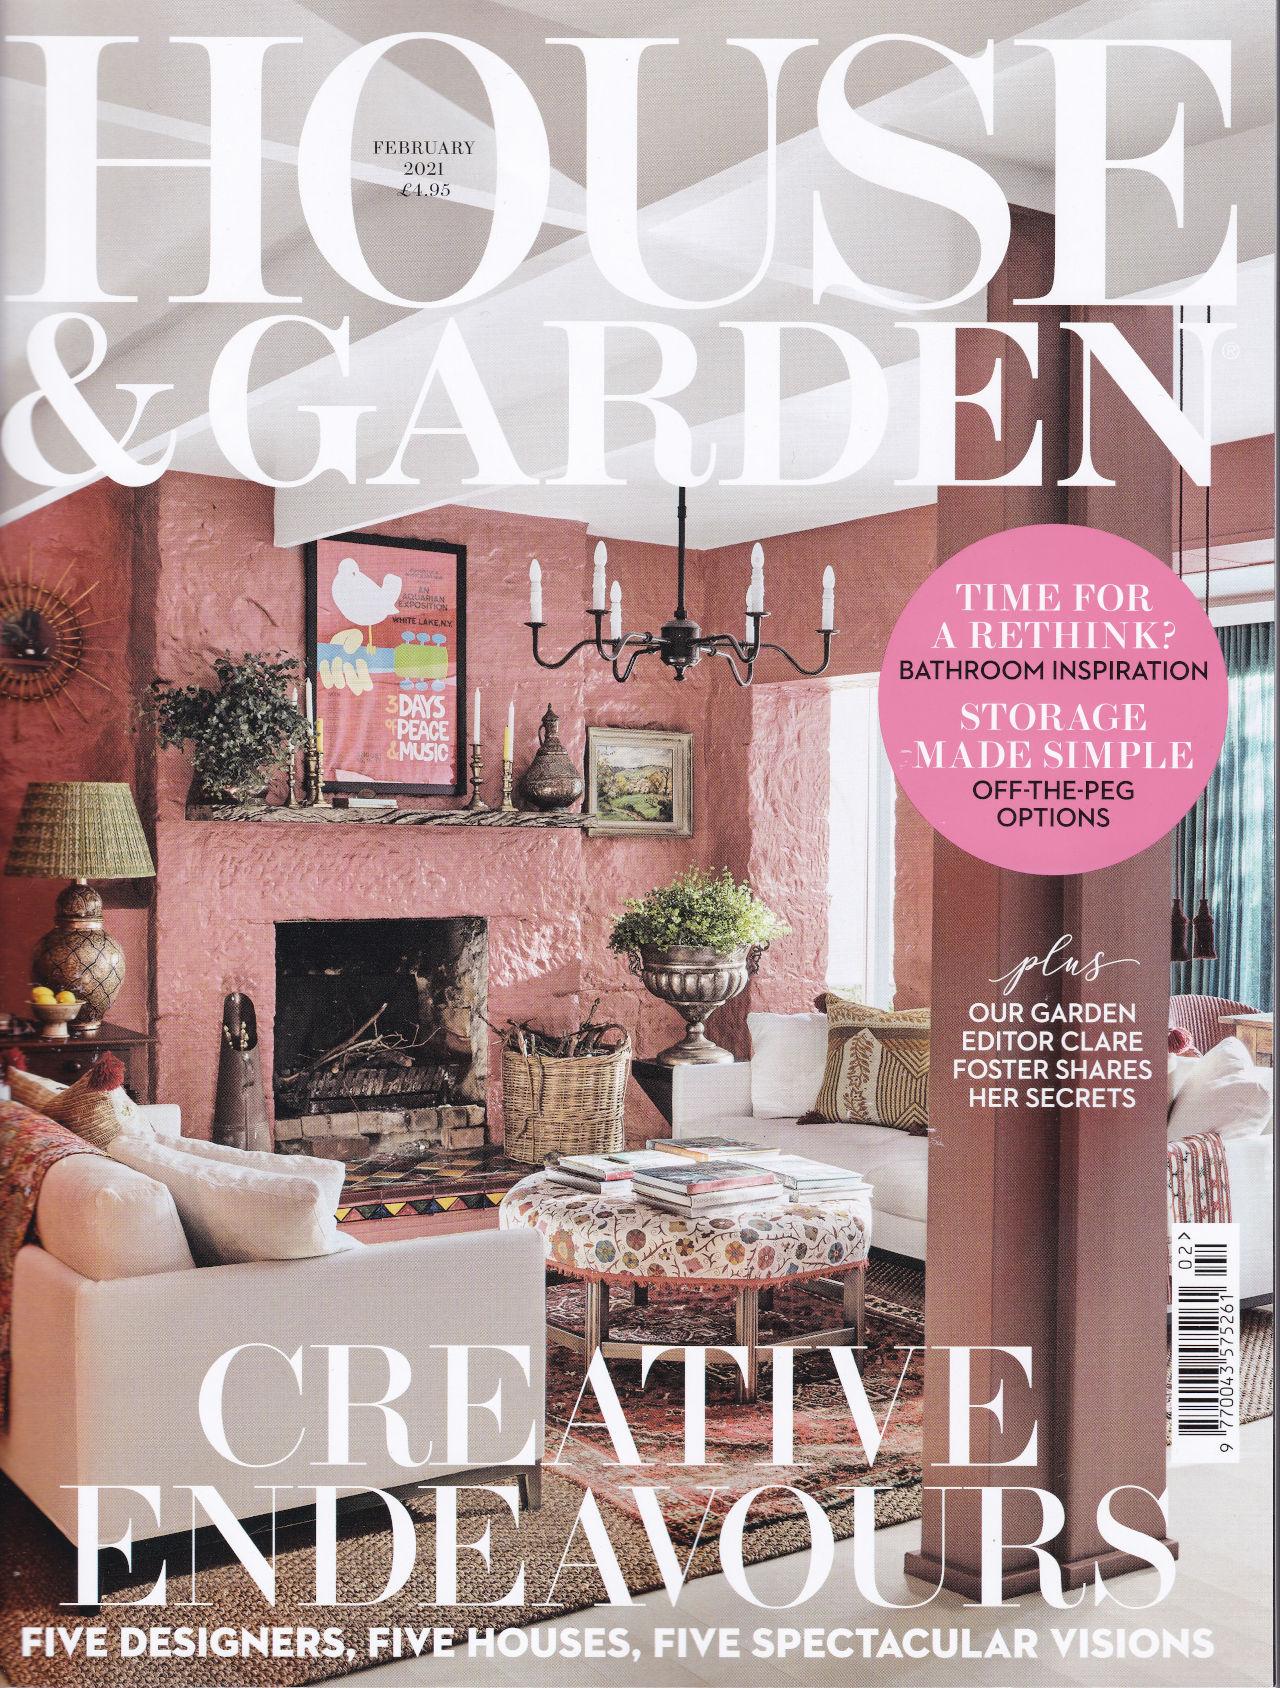 house and garden feb 21 cover web